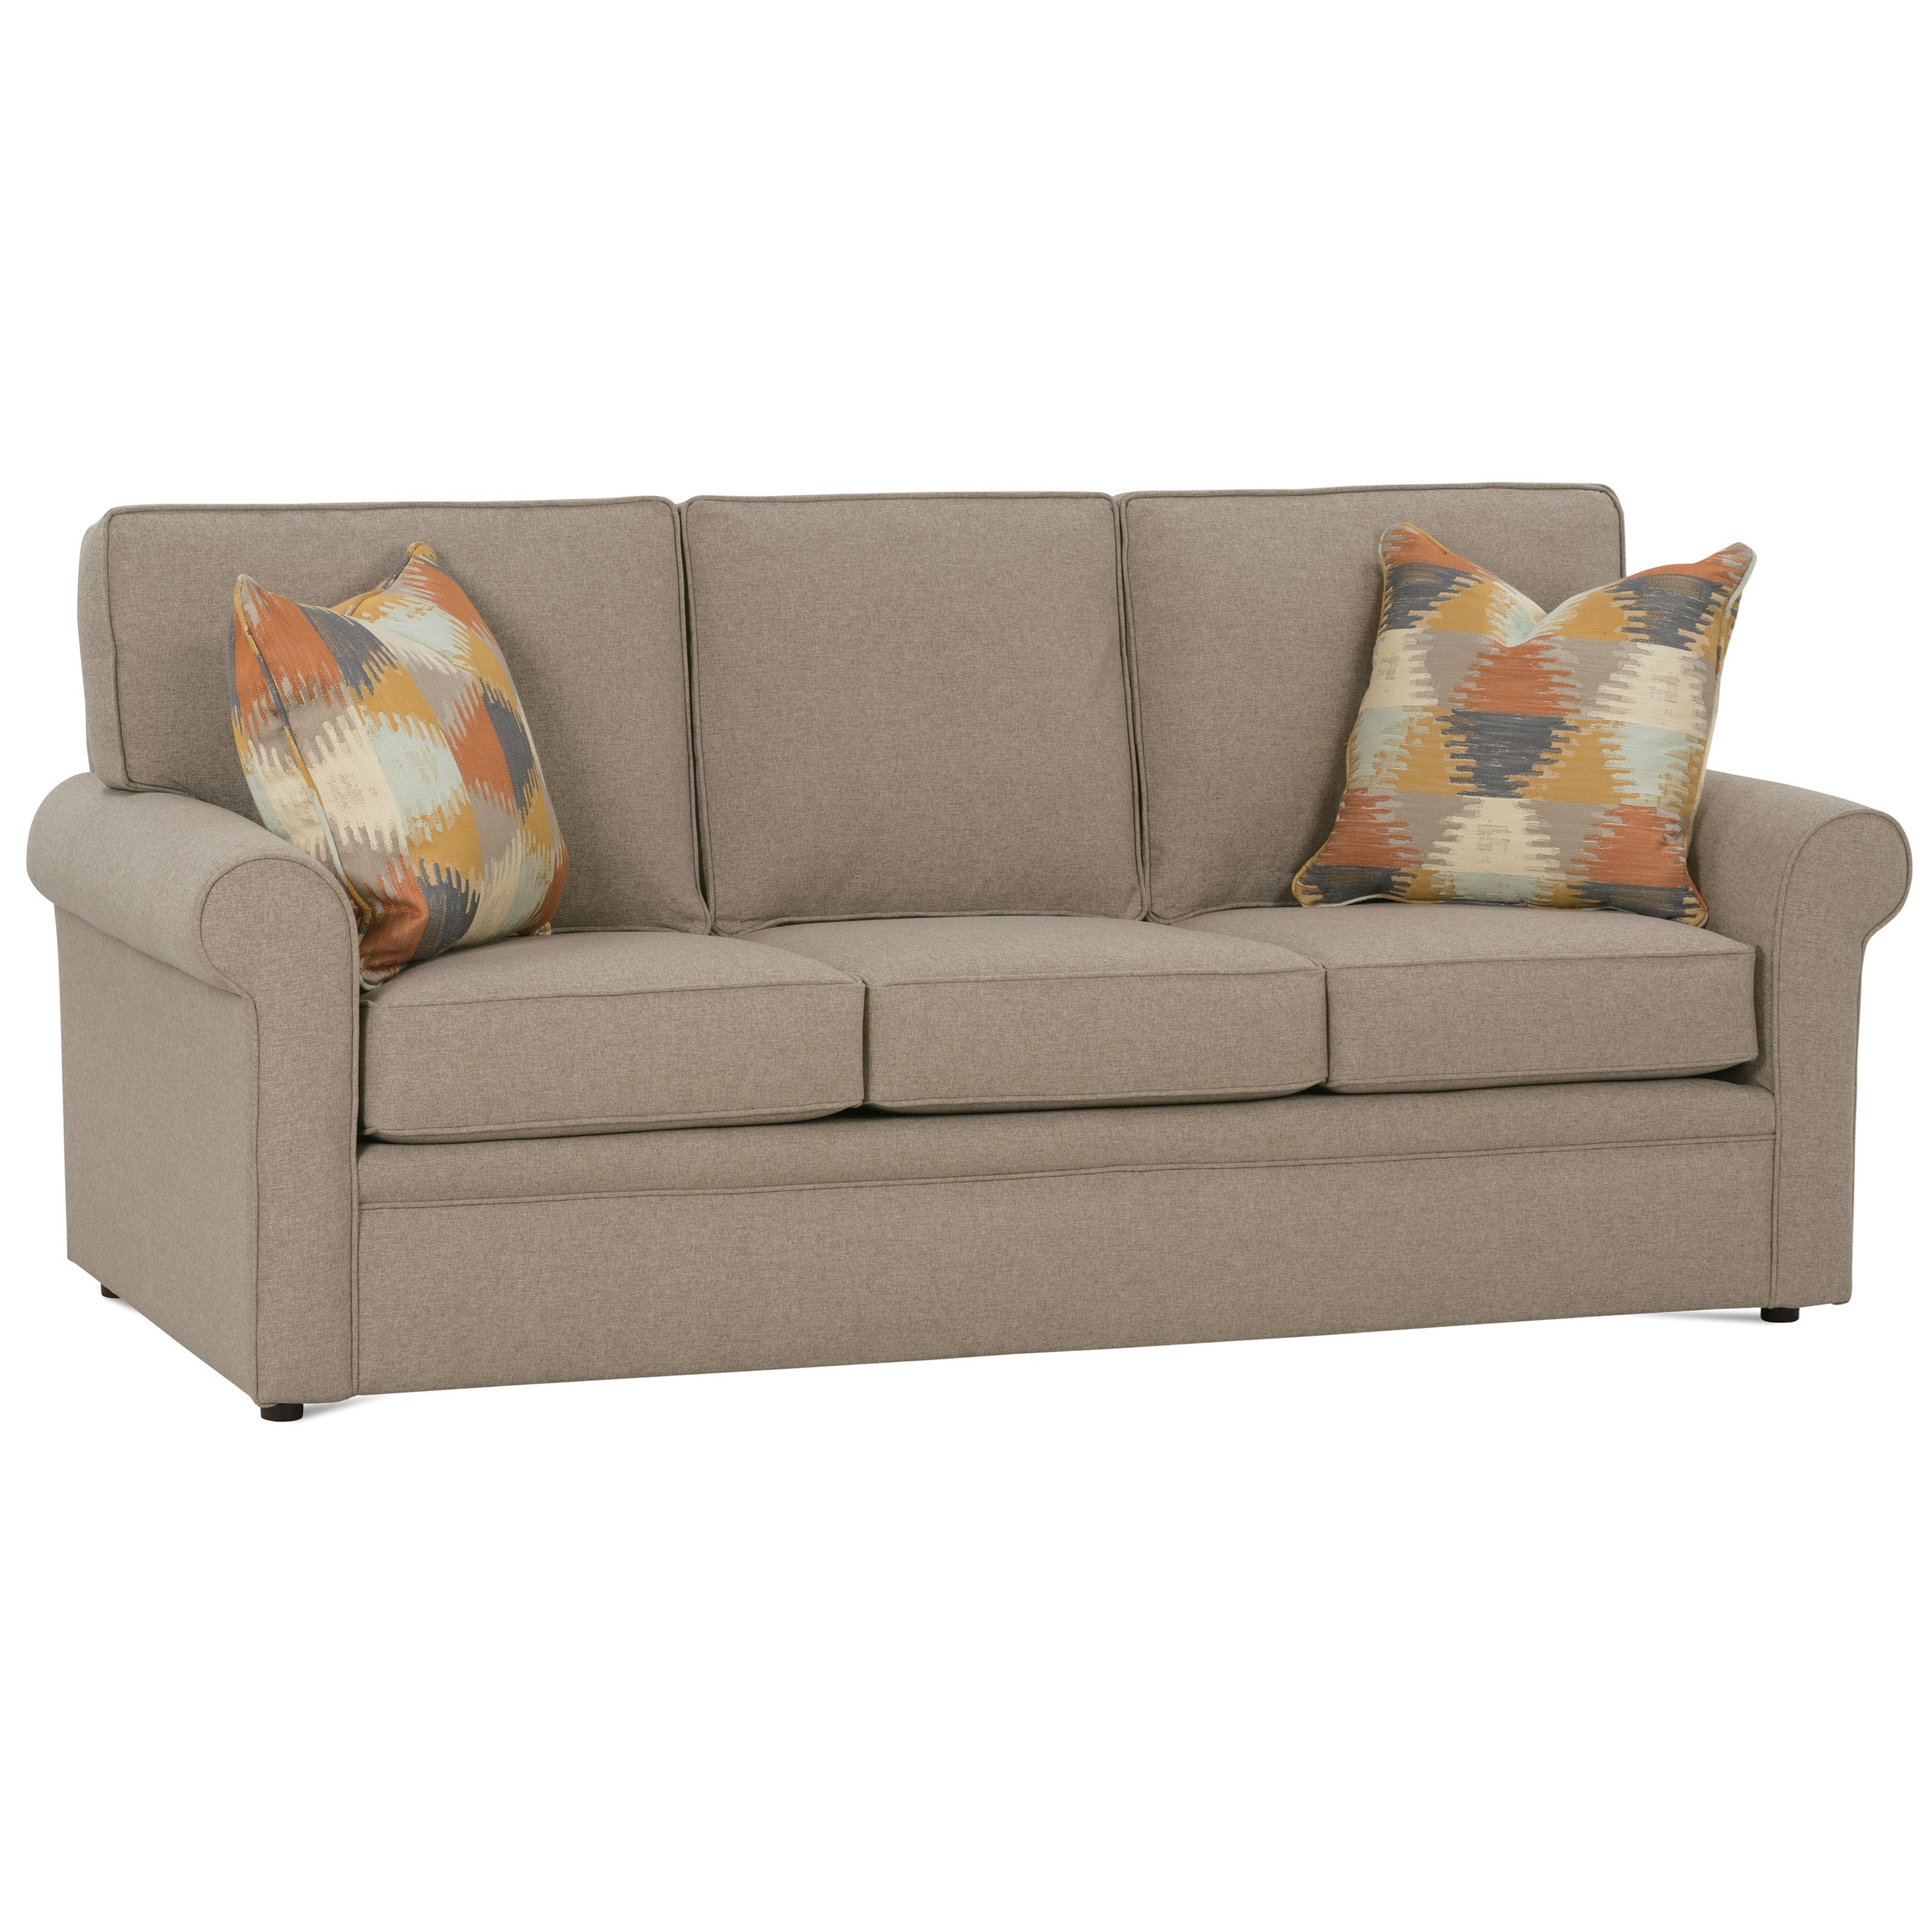 dalton sofa bed orange sleeper rowe queen belfort furniture sofas